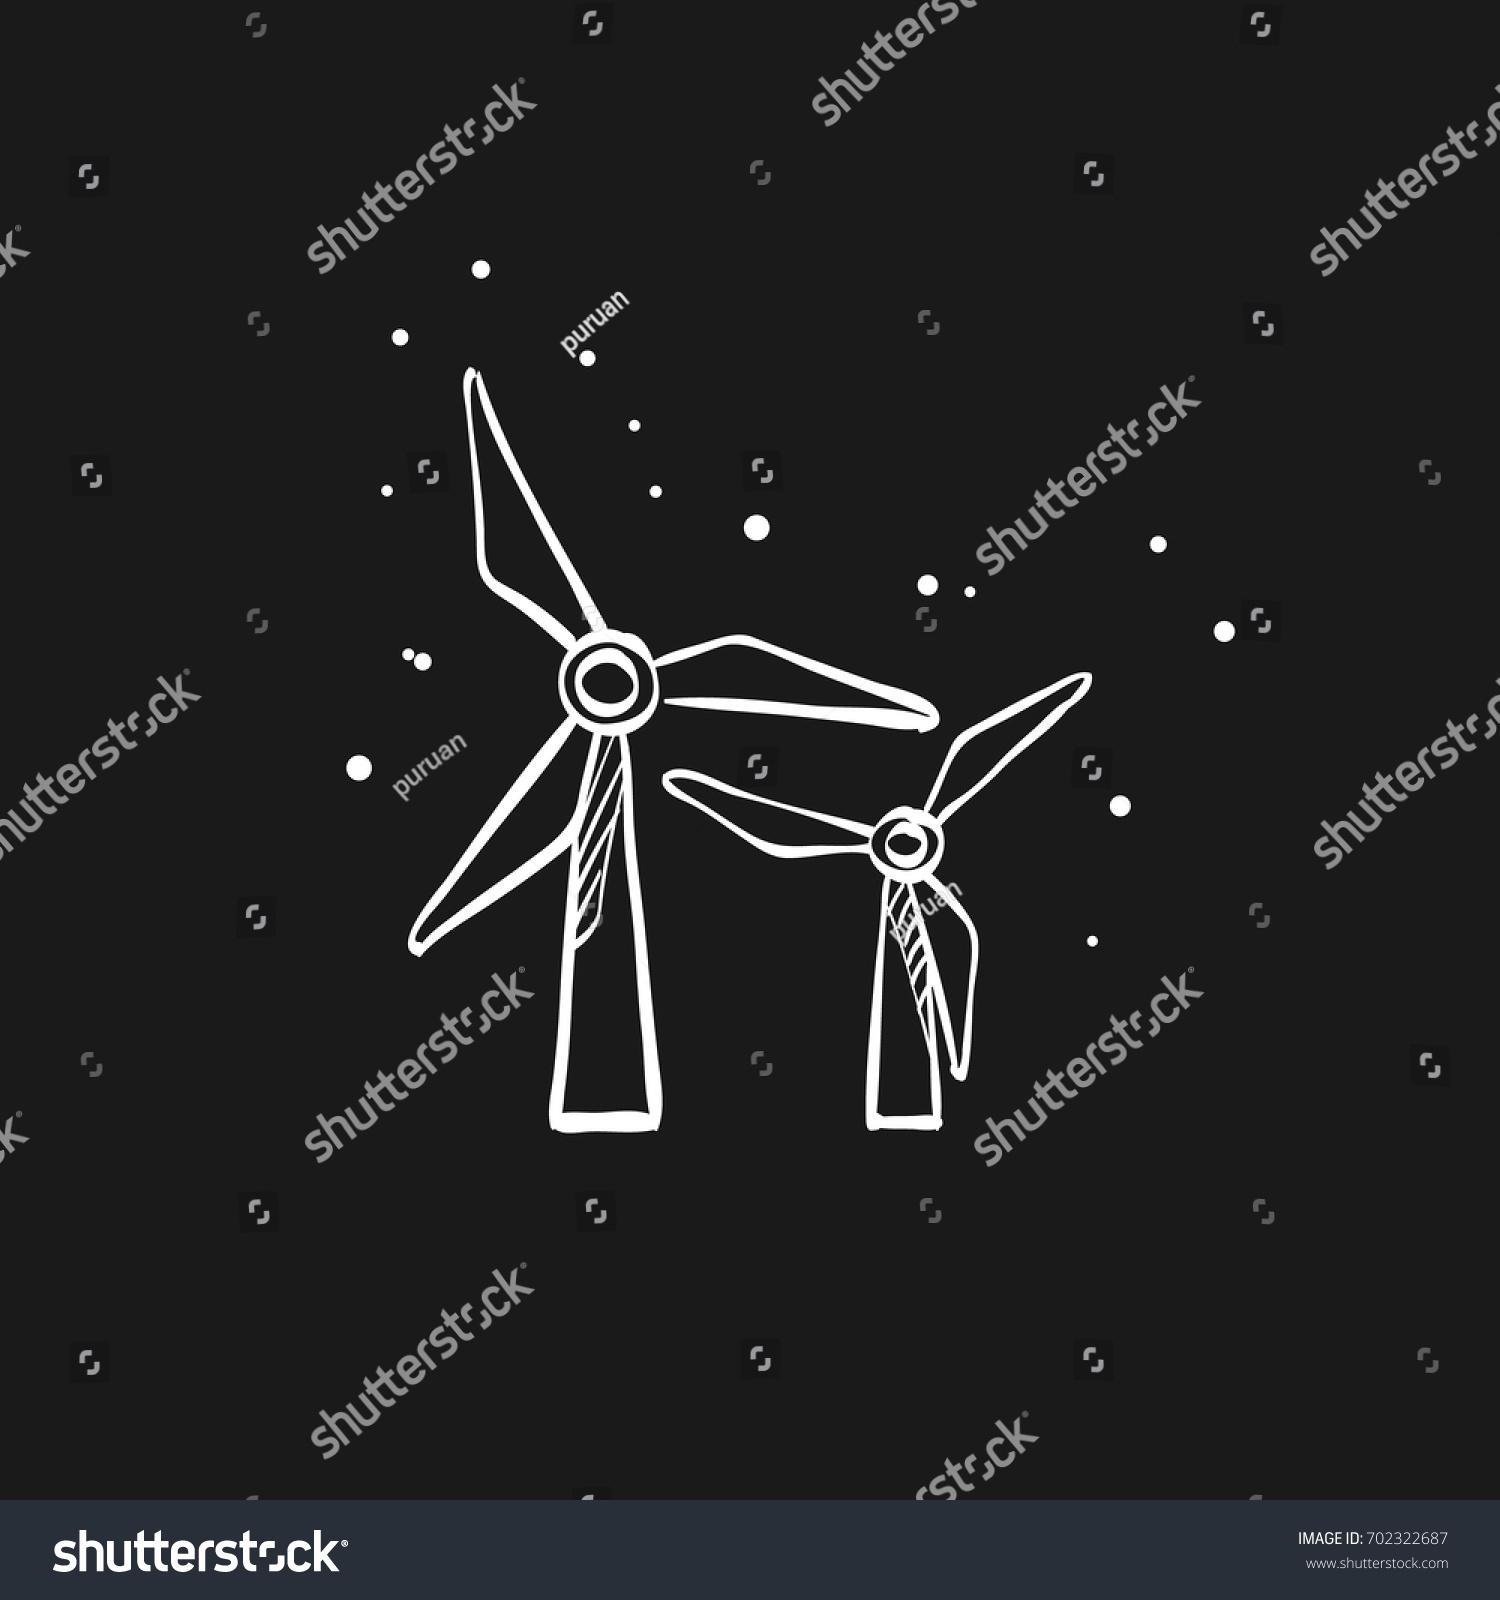 Wind Turbine Icon Doodle Sketch Lines Stock Vector